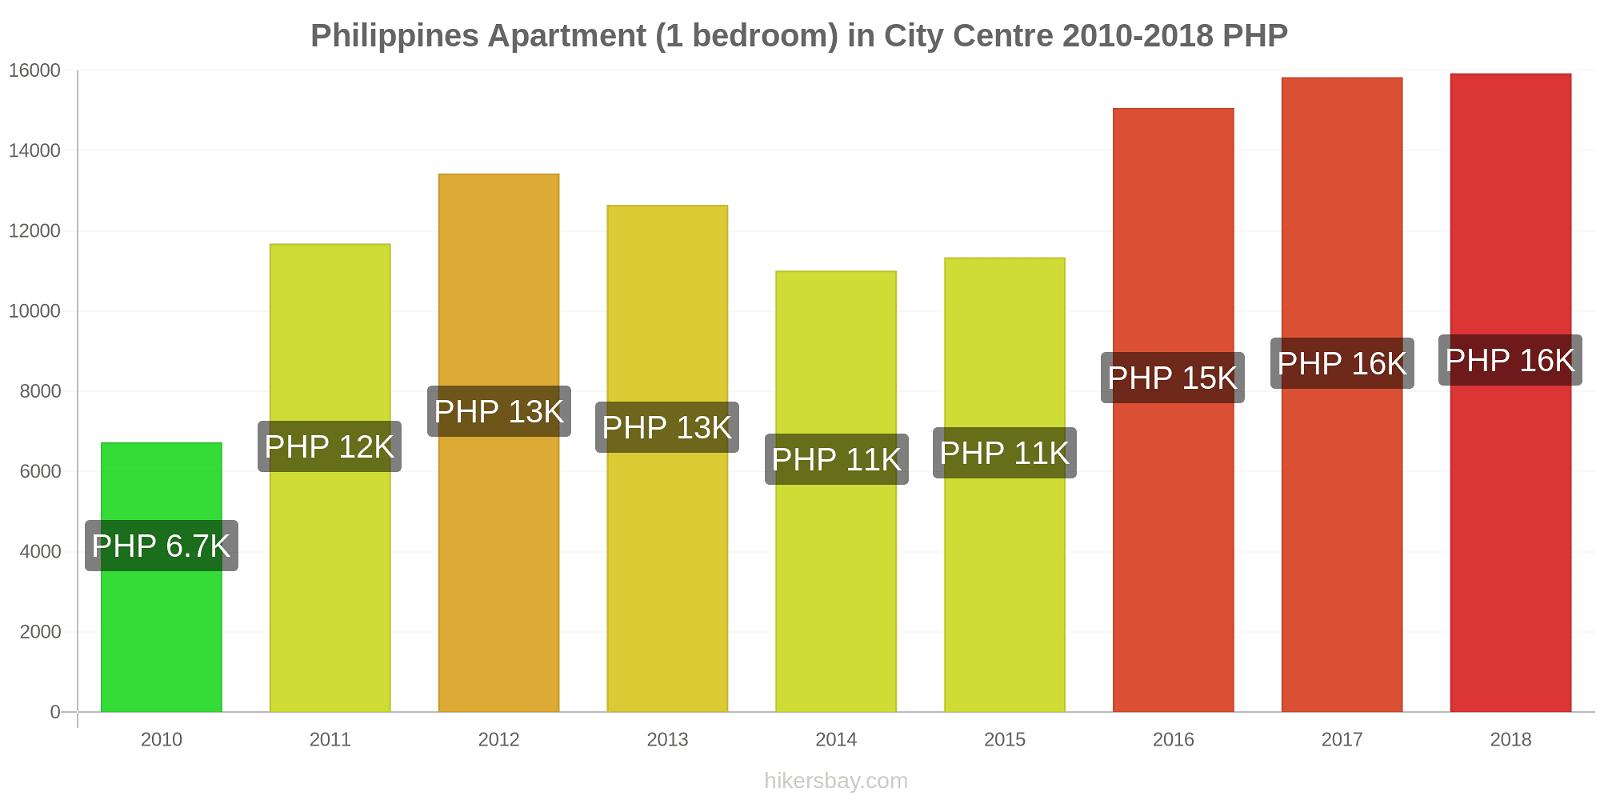 Philippines price changes Apartment (1 bedroom) in City Centre hikersbay.com